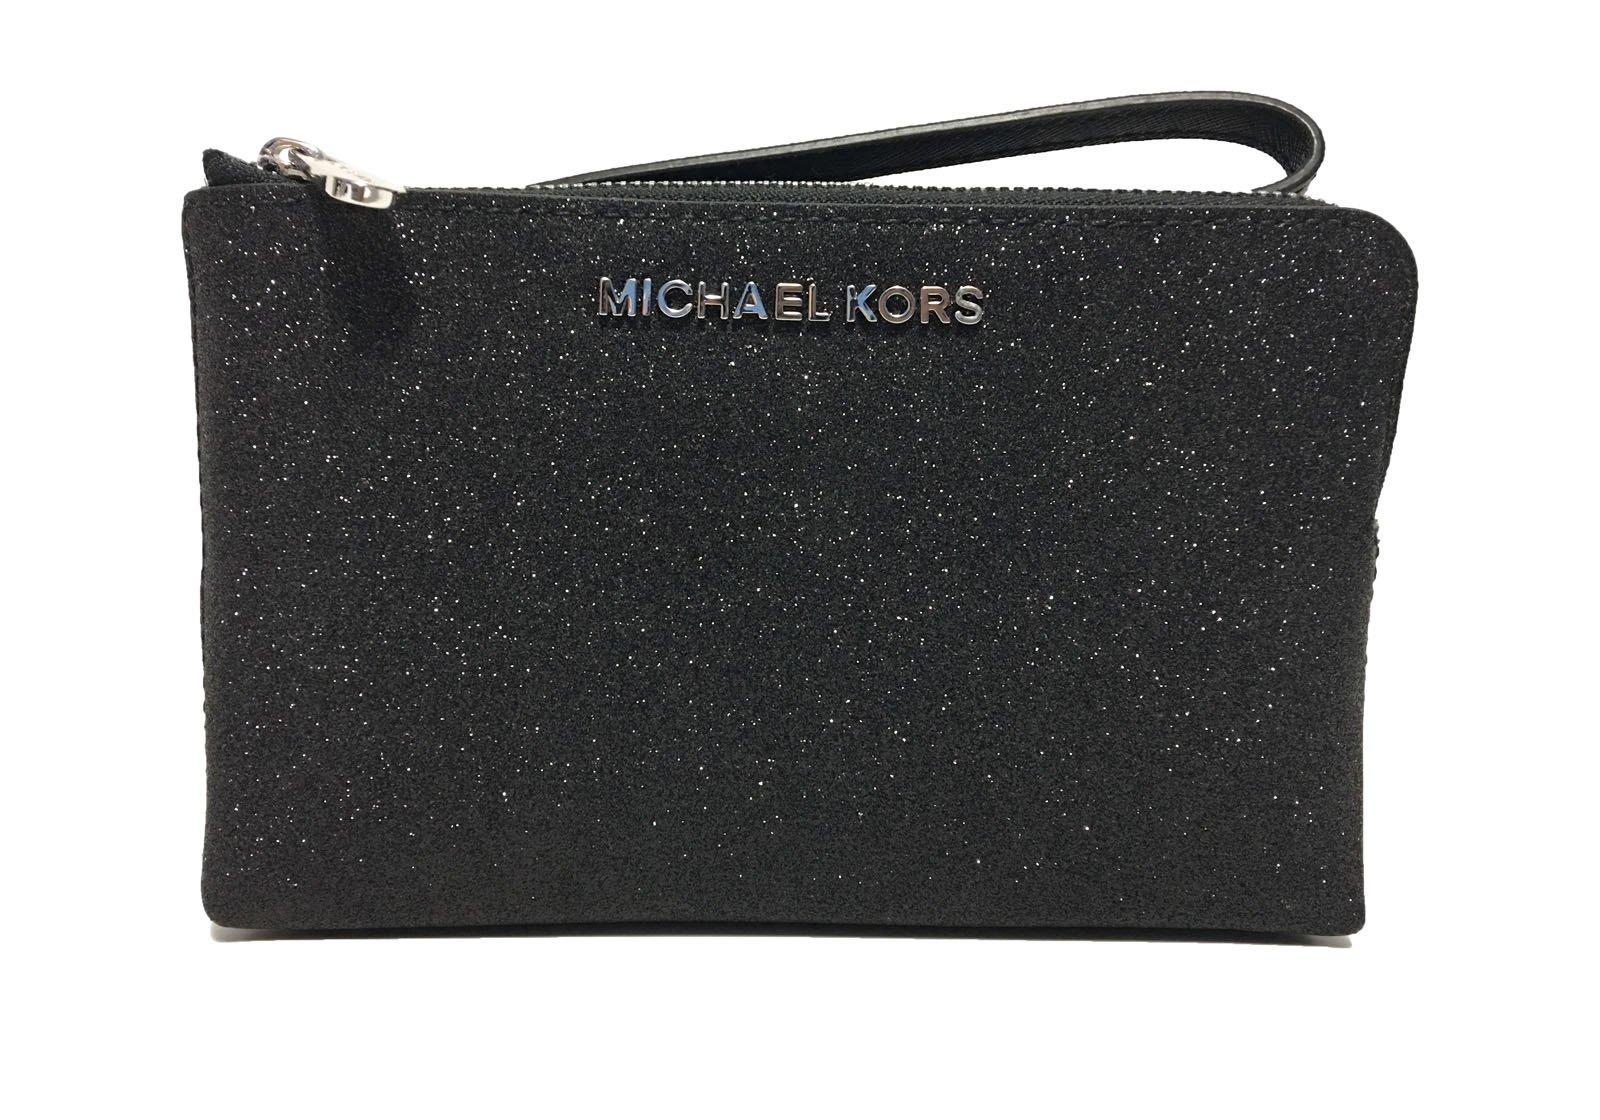 Michael Kors Jet Set Travel Double Zip Wristlet Black Glitter